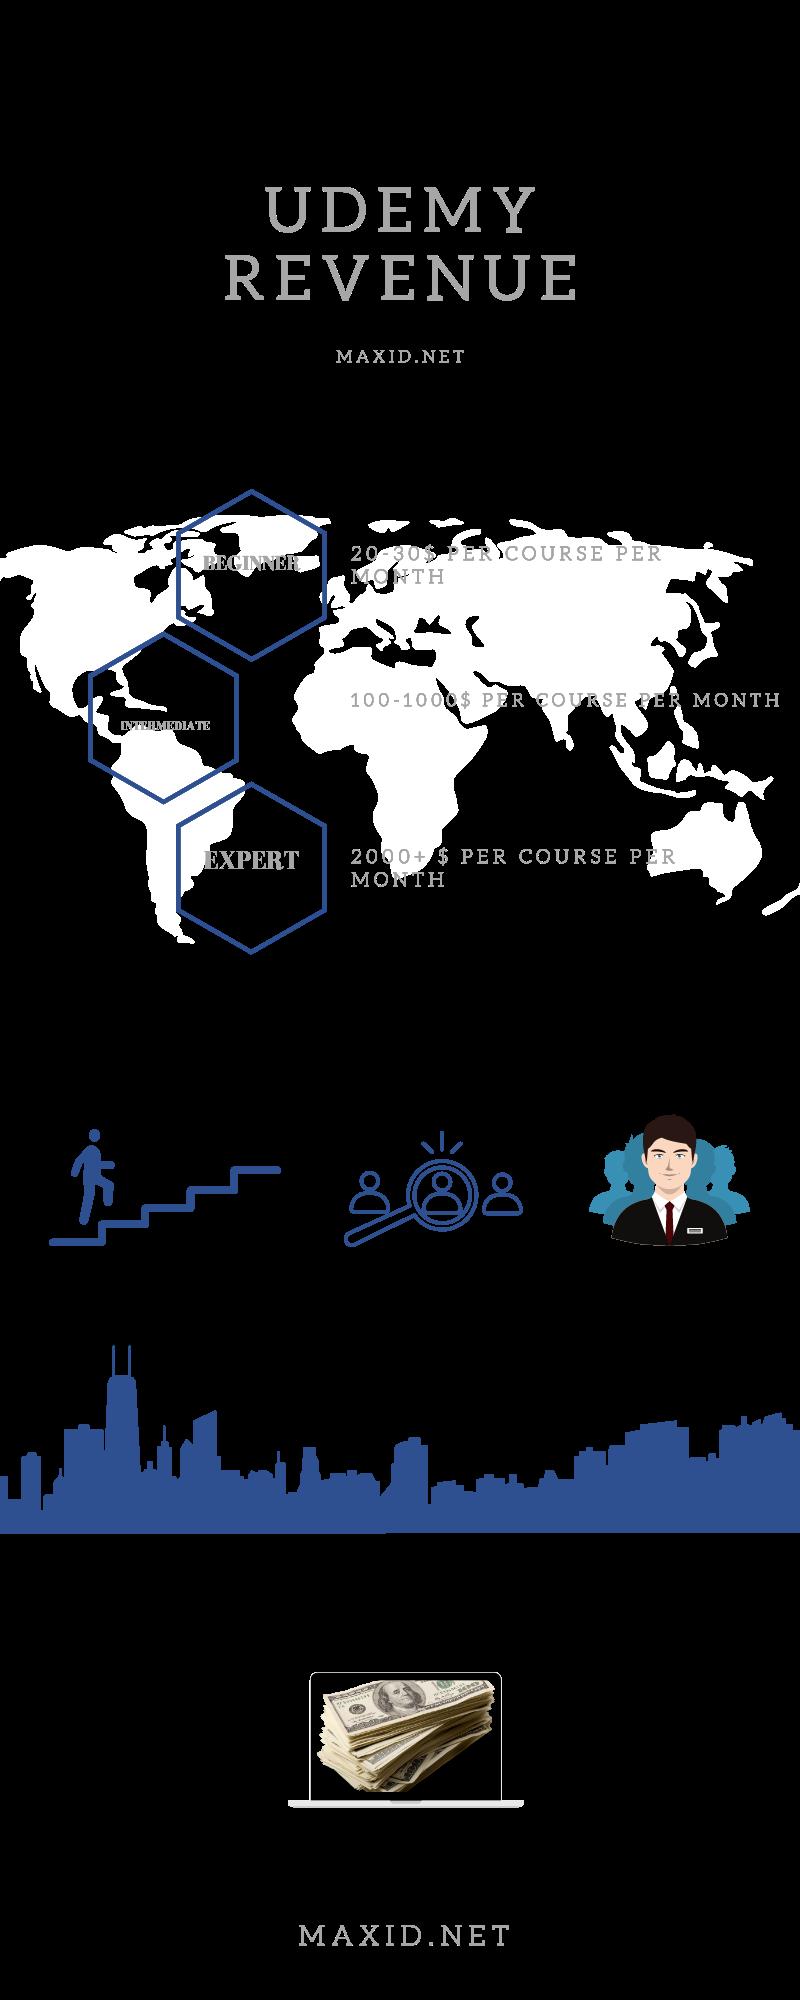 Udemy-Revenue-Infographic